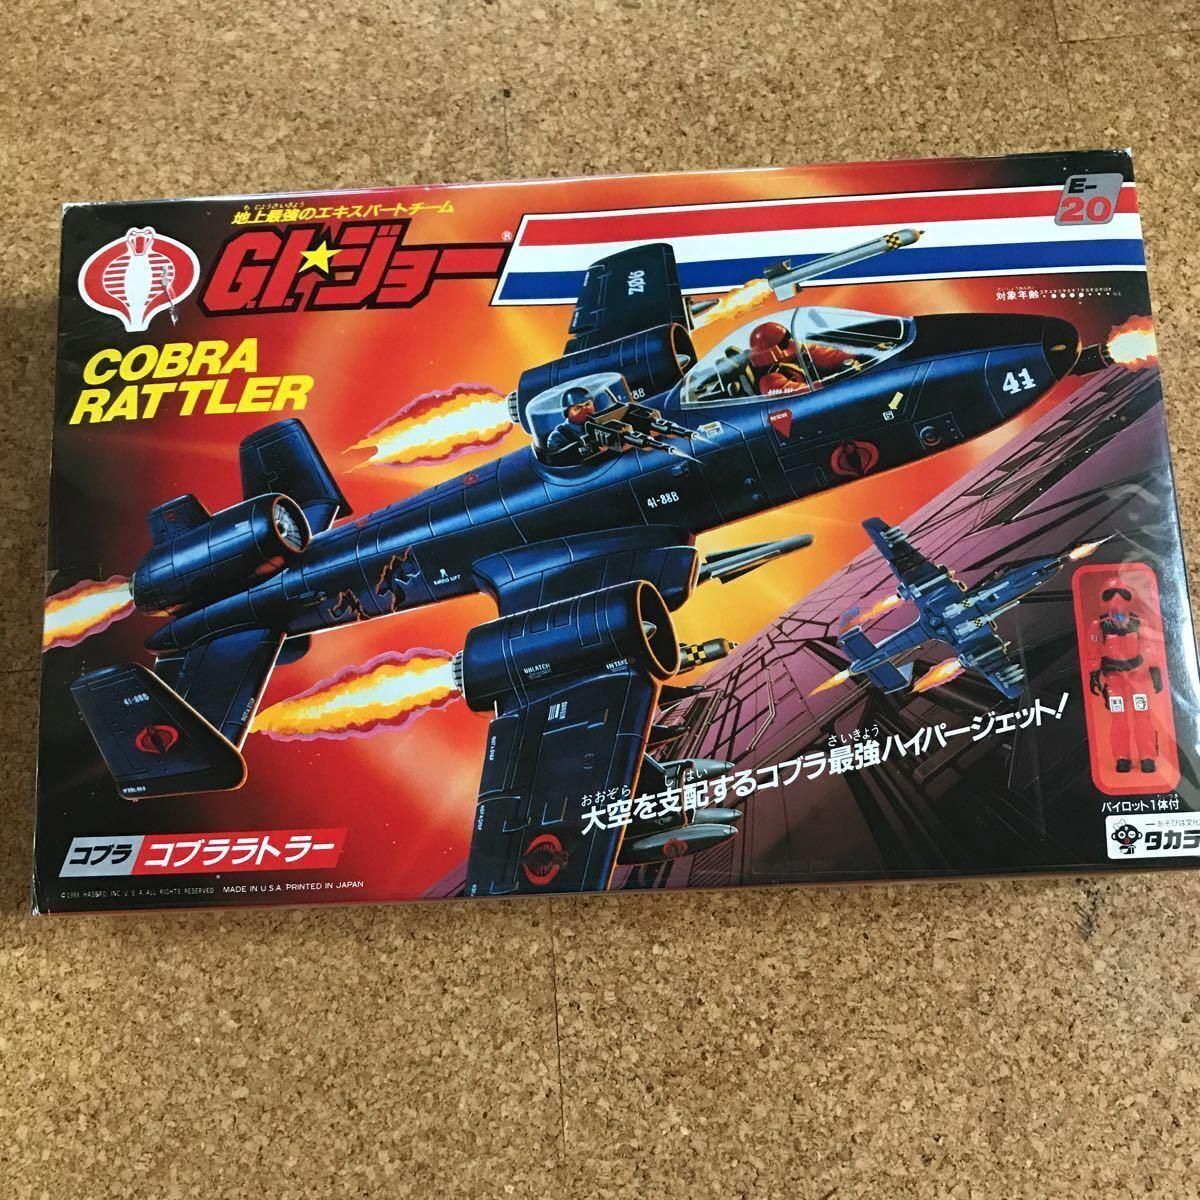 Takara G I Joe Vehículo-e 20 Cobra Rattler - 3.75 figura HASBRO NUEVO en caja Japón 1986